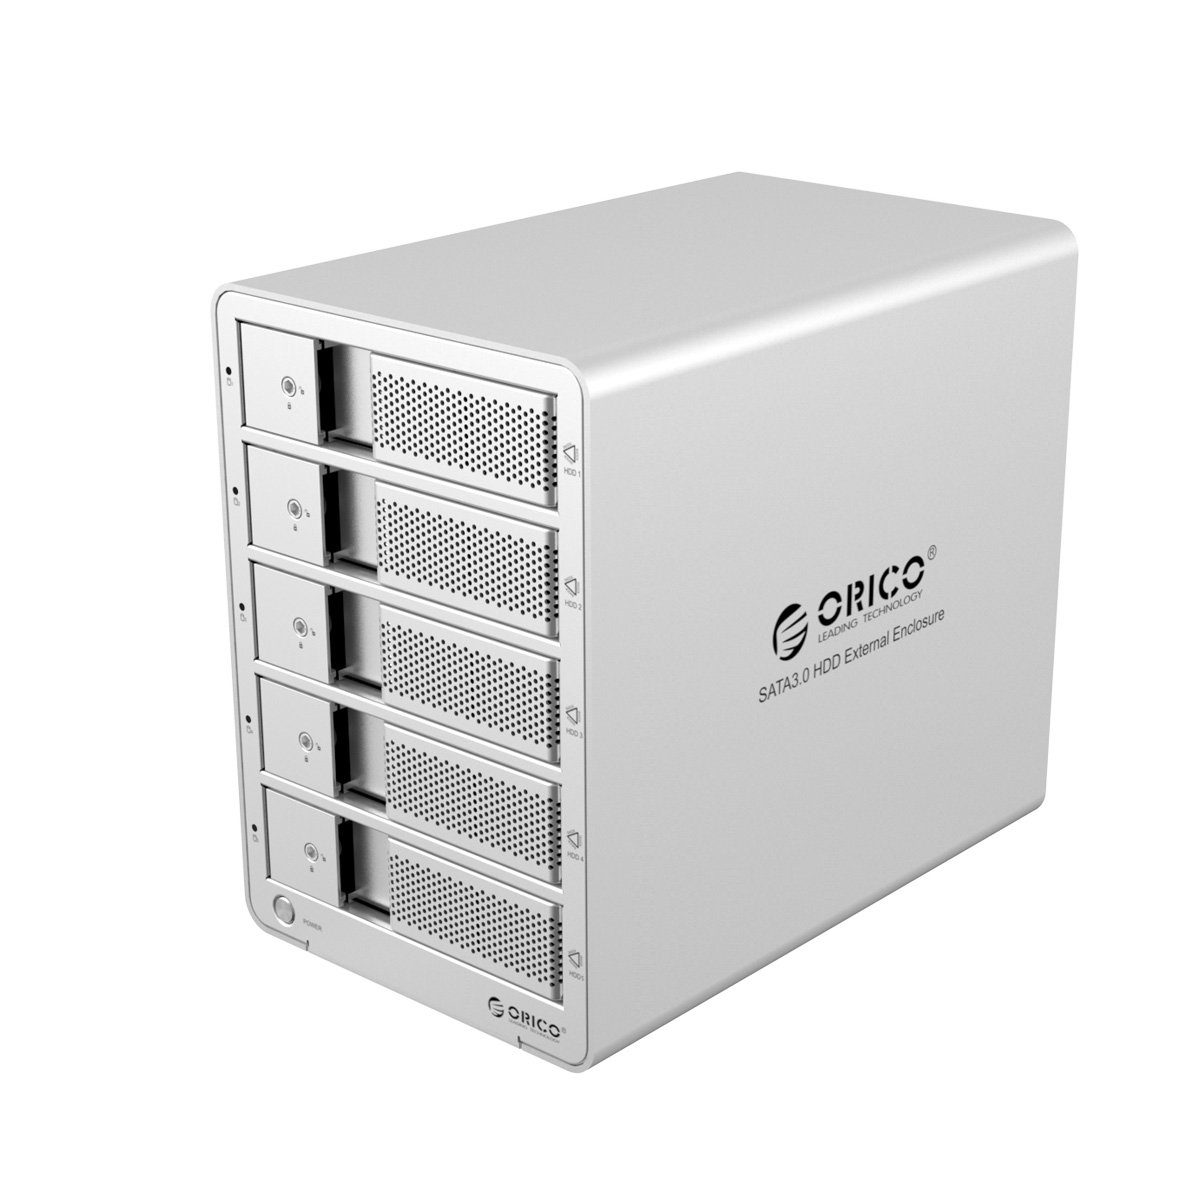 ORICO Tool Free Aluminum USB 3.0 5 bay 3.5-inch SATA Hard Drive Enclosure Support 5x 6TB Drive-Sliver (9558U3) by ORICO